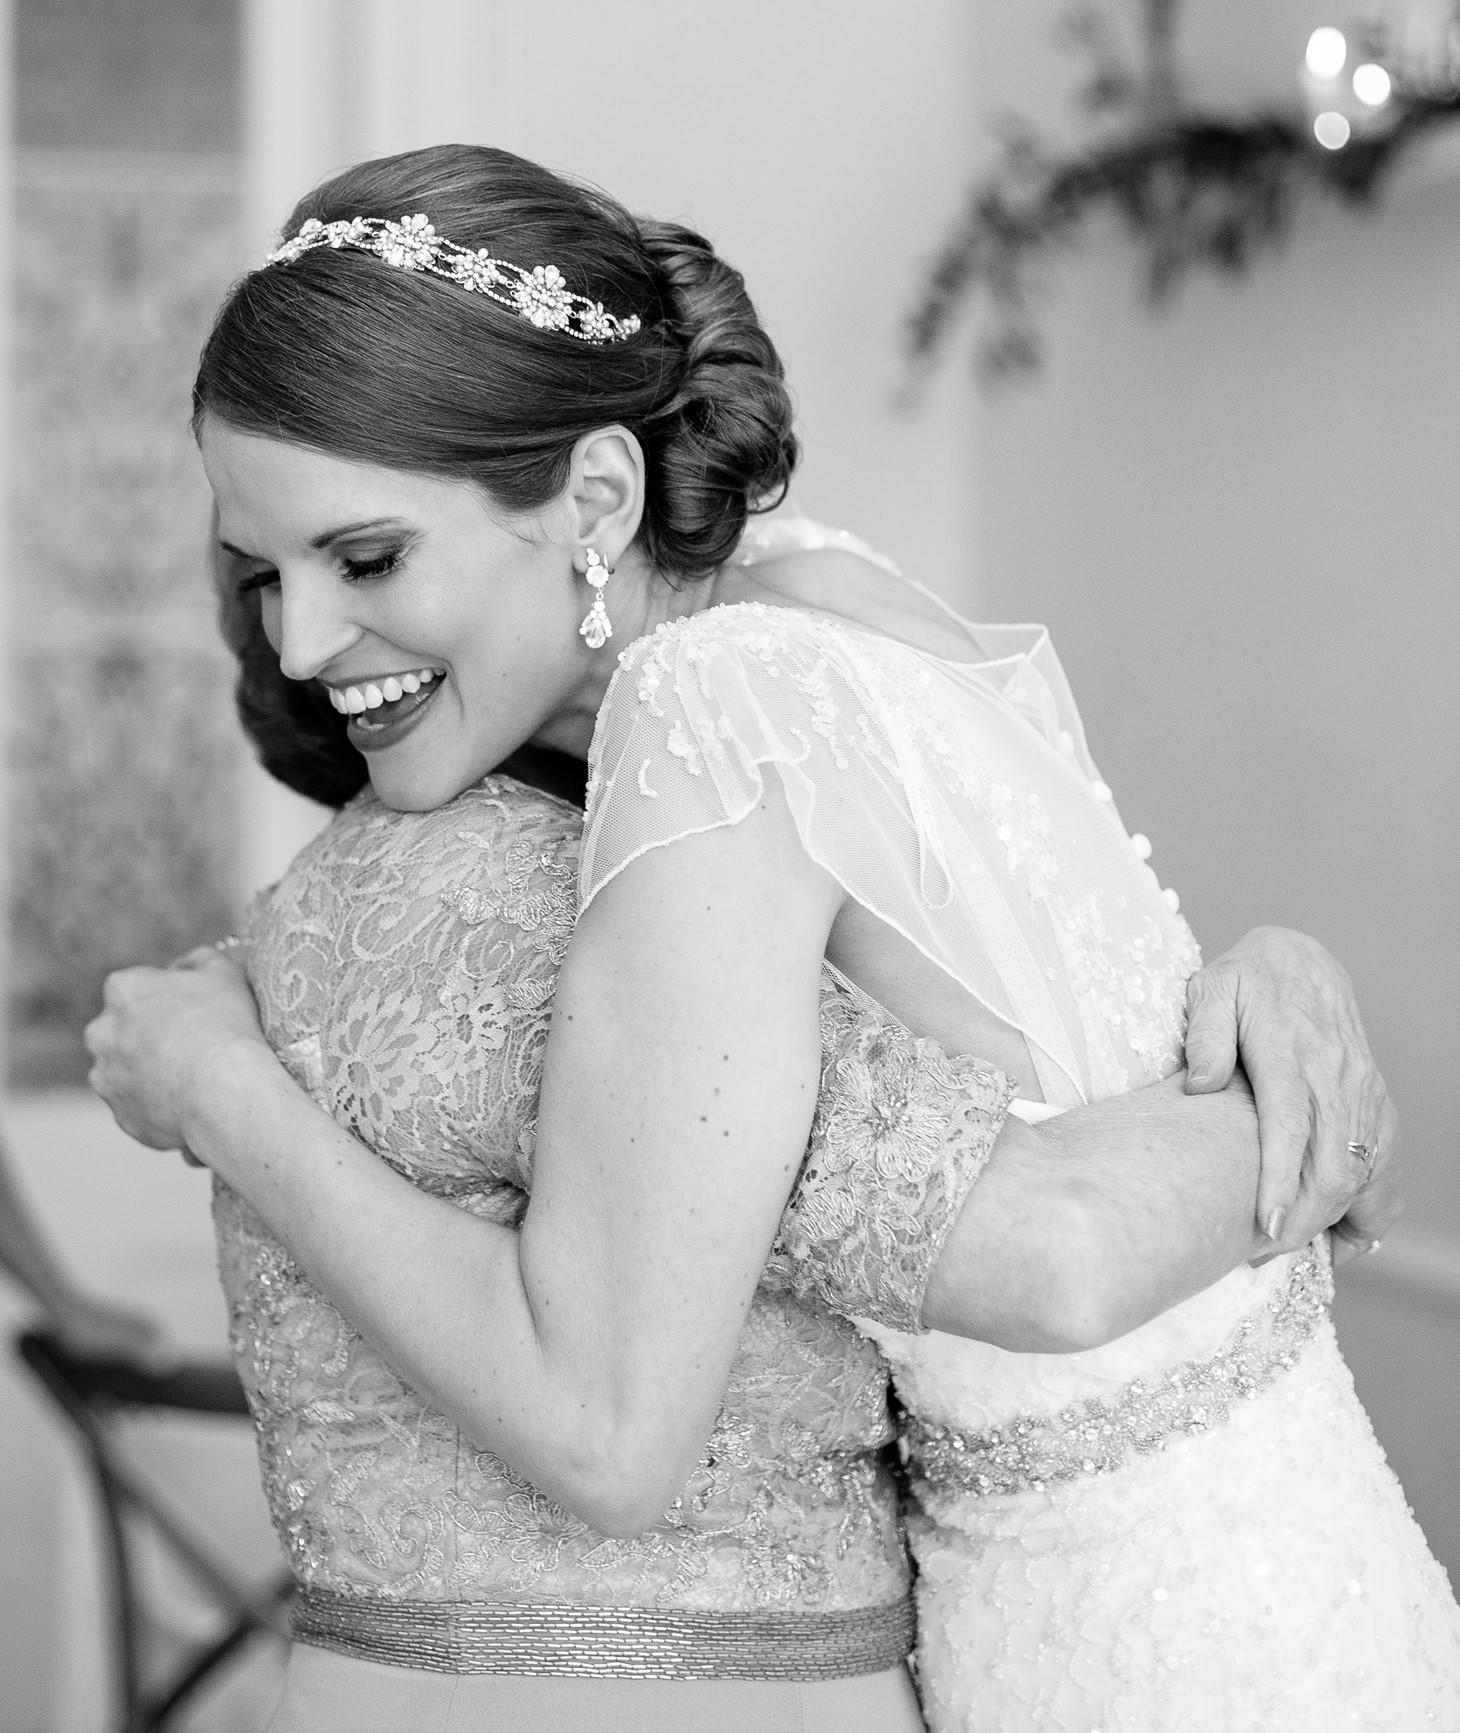 014-nyc-wedding-photographer-brooklyn-restaurant-2.jpg